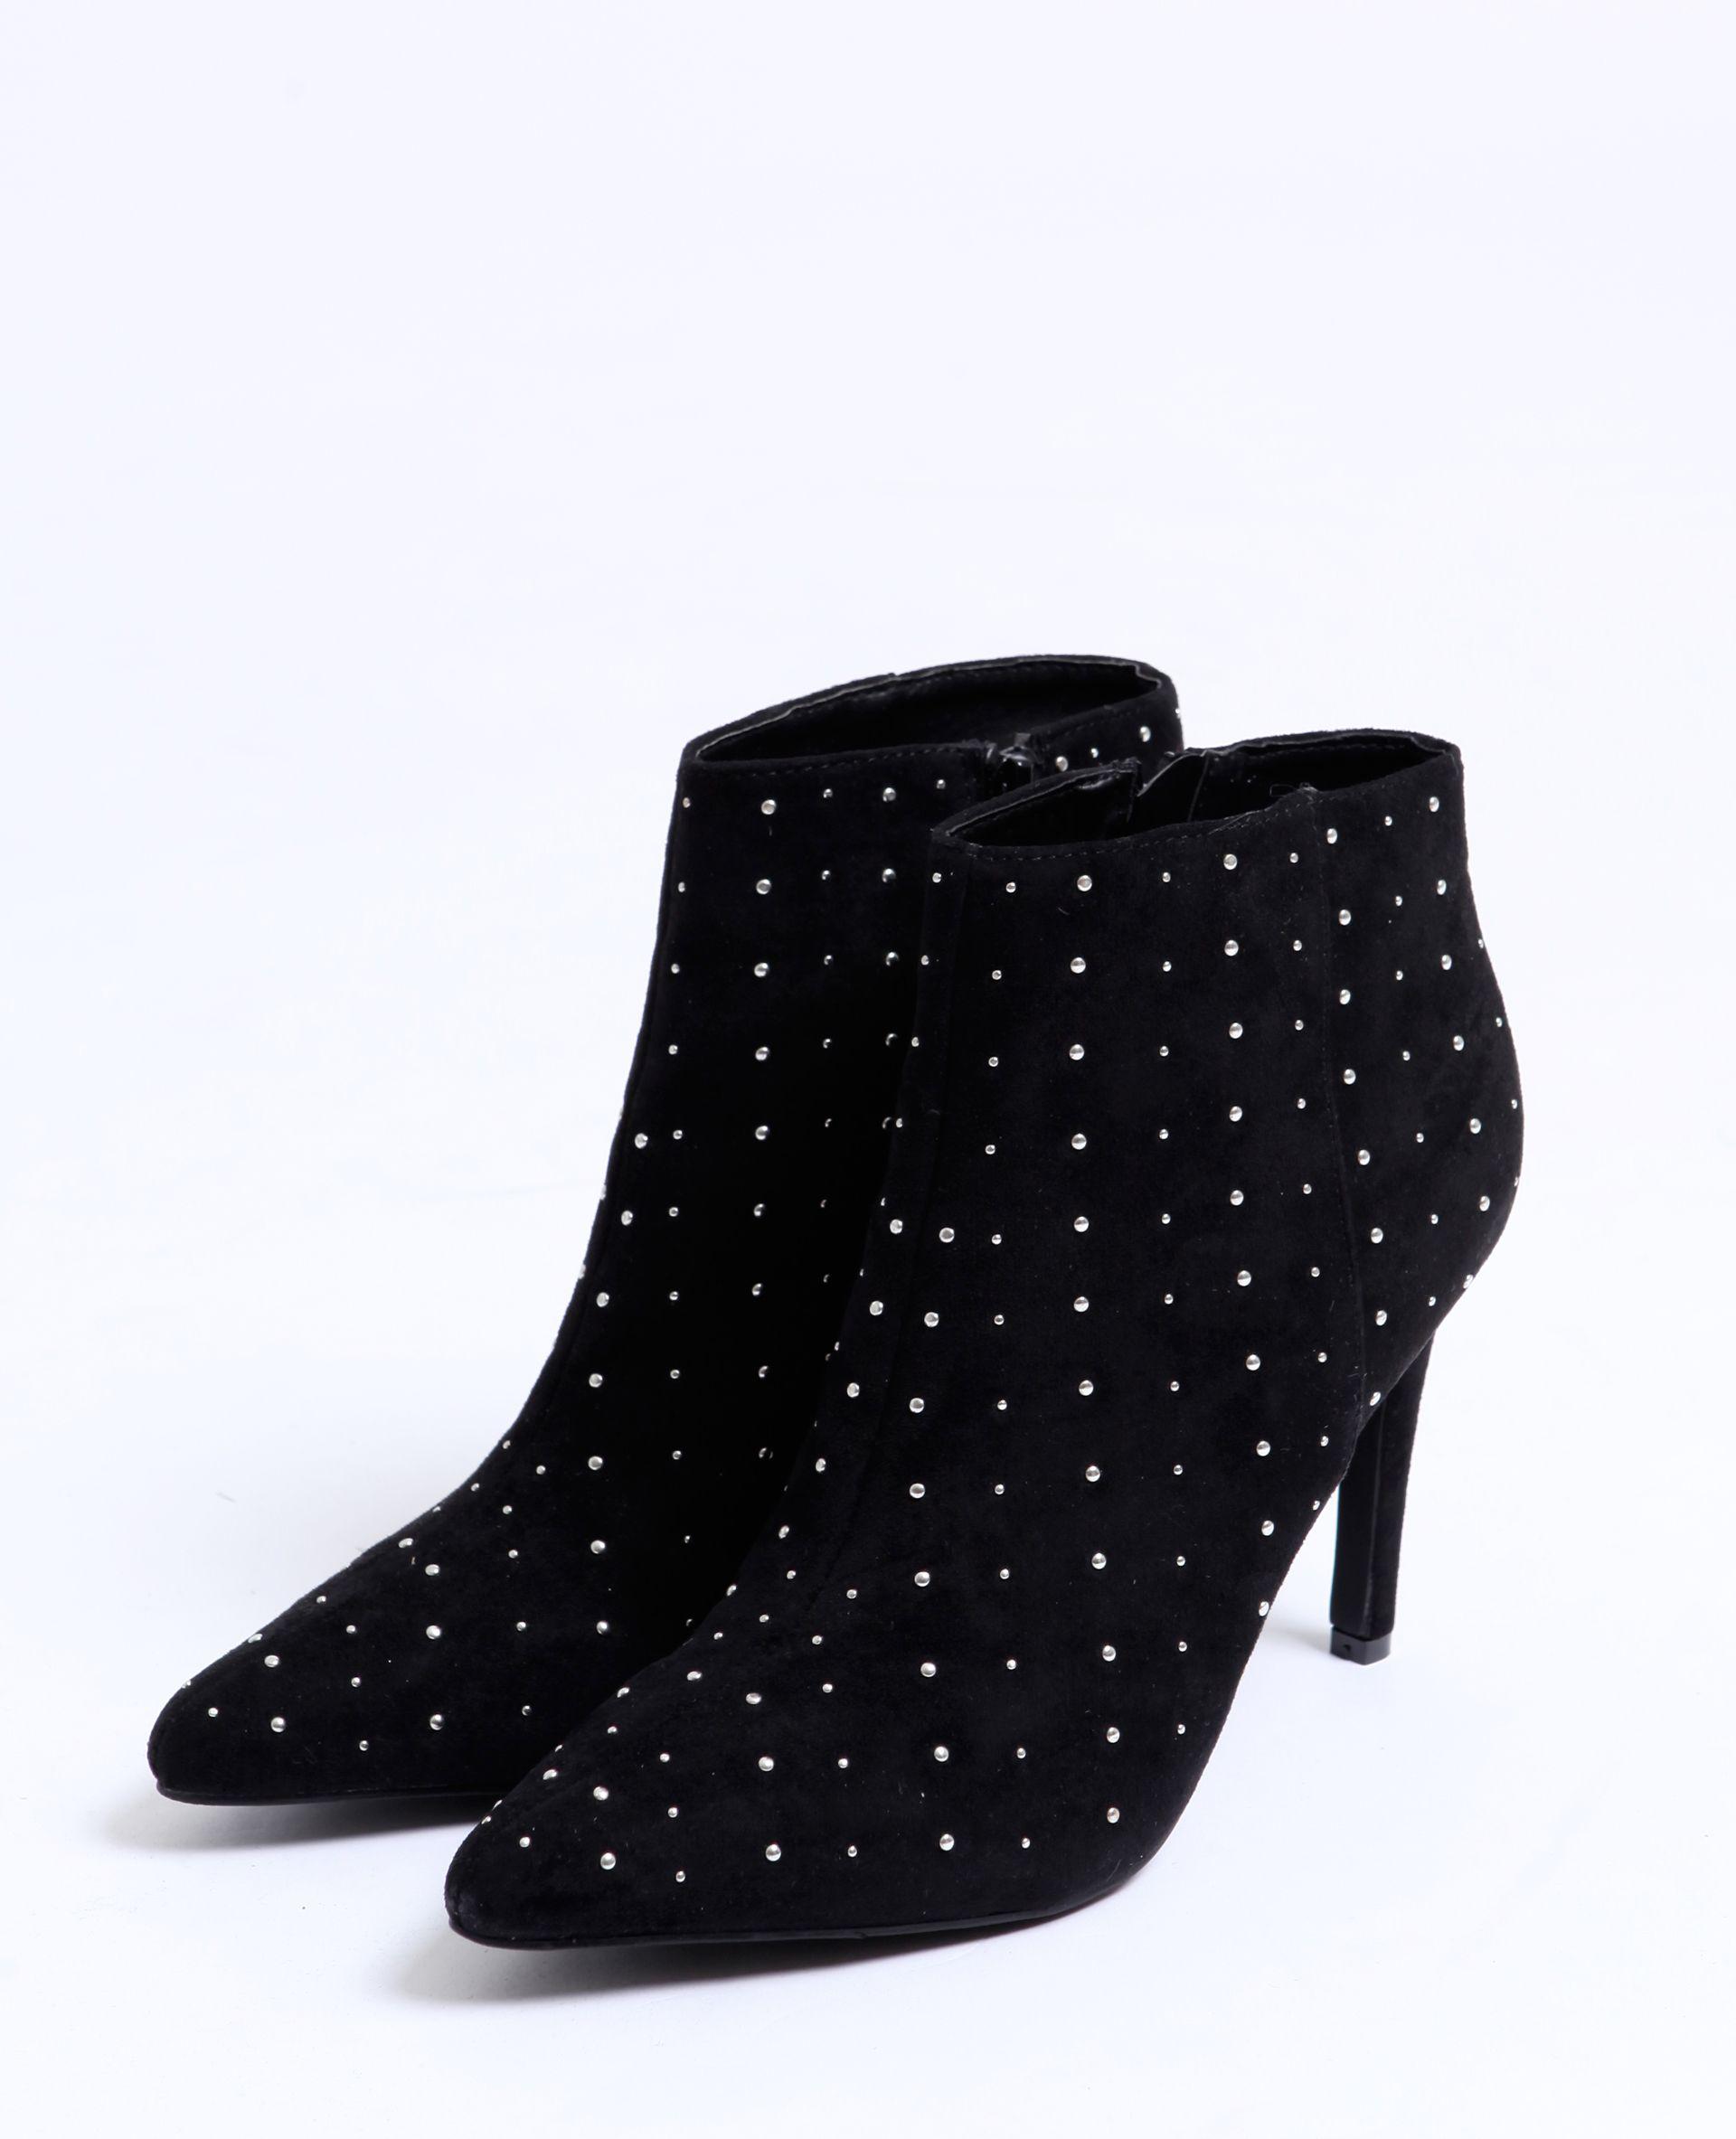 Boots Cloutees Noir 916801899a08 Pimkie 2018 19 Winter